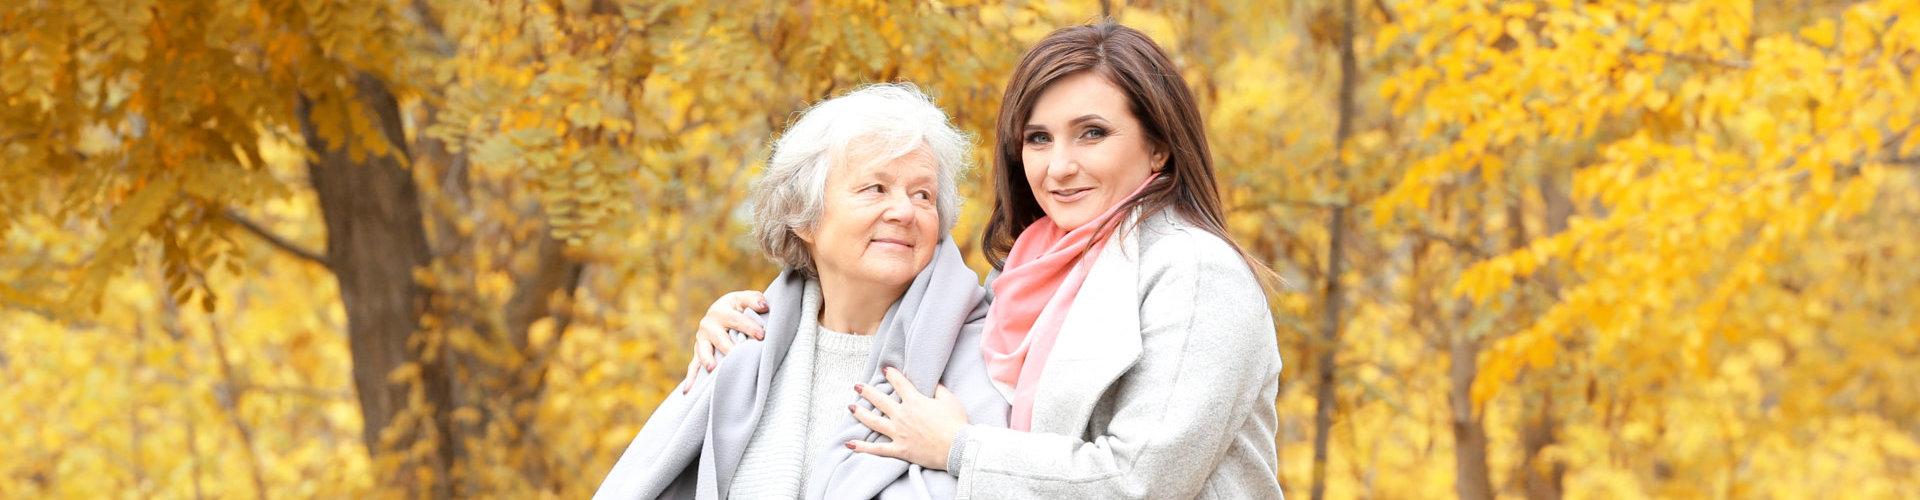 senior woman looking at the smiling caregiver